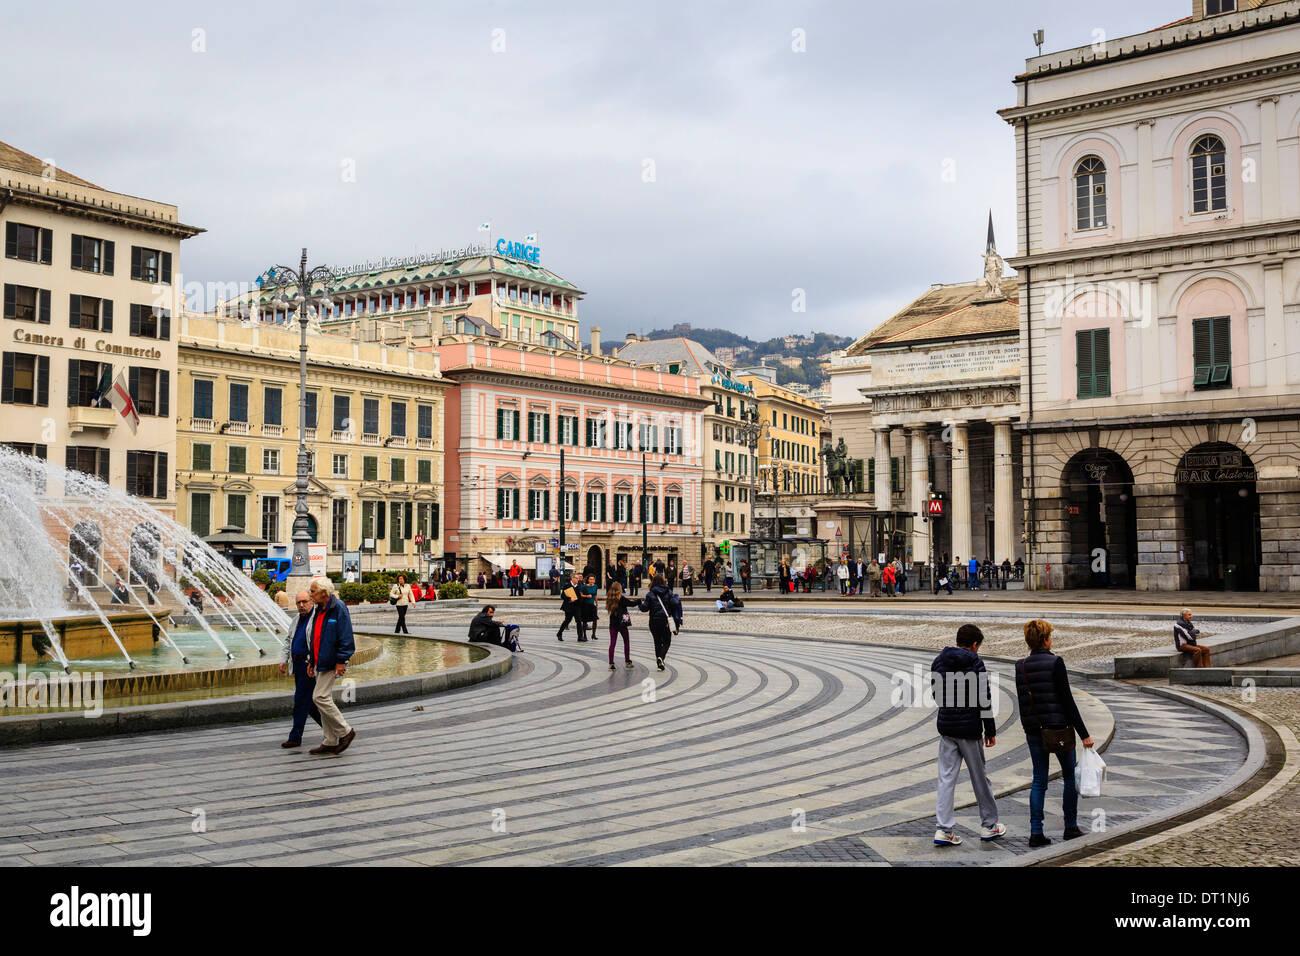 De Ferrari square, Genoa, Liguria, Italy, Europe - Stock Image